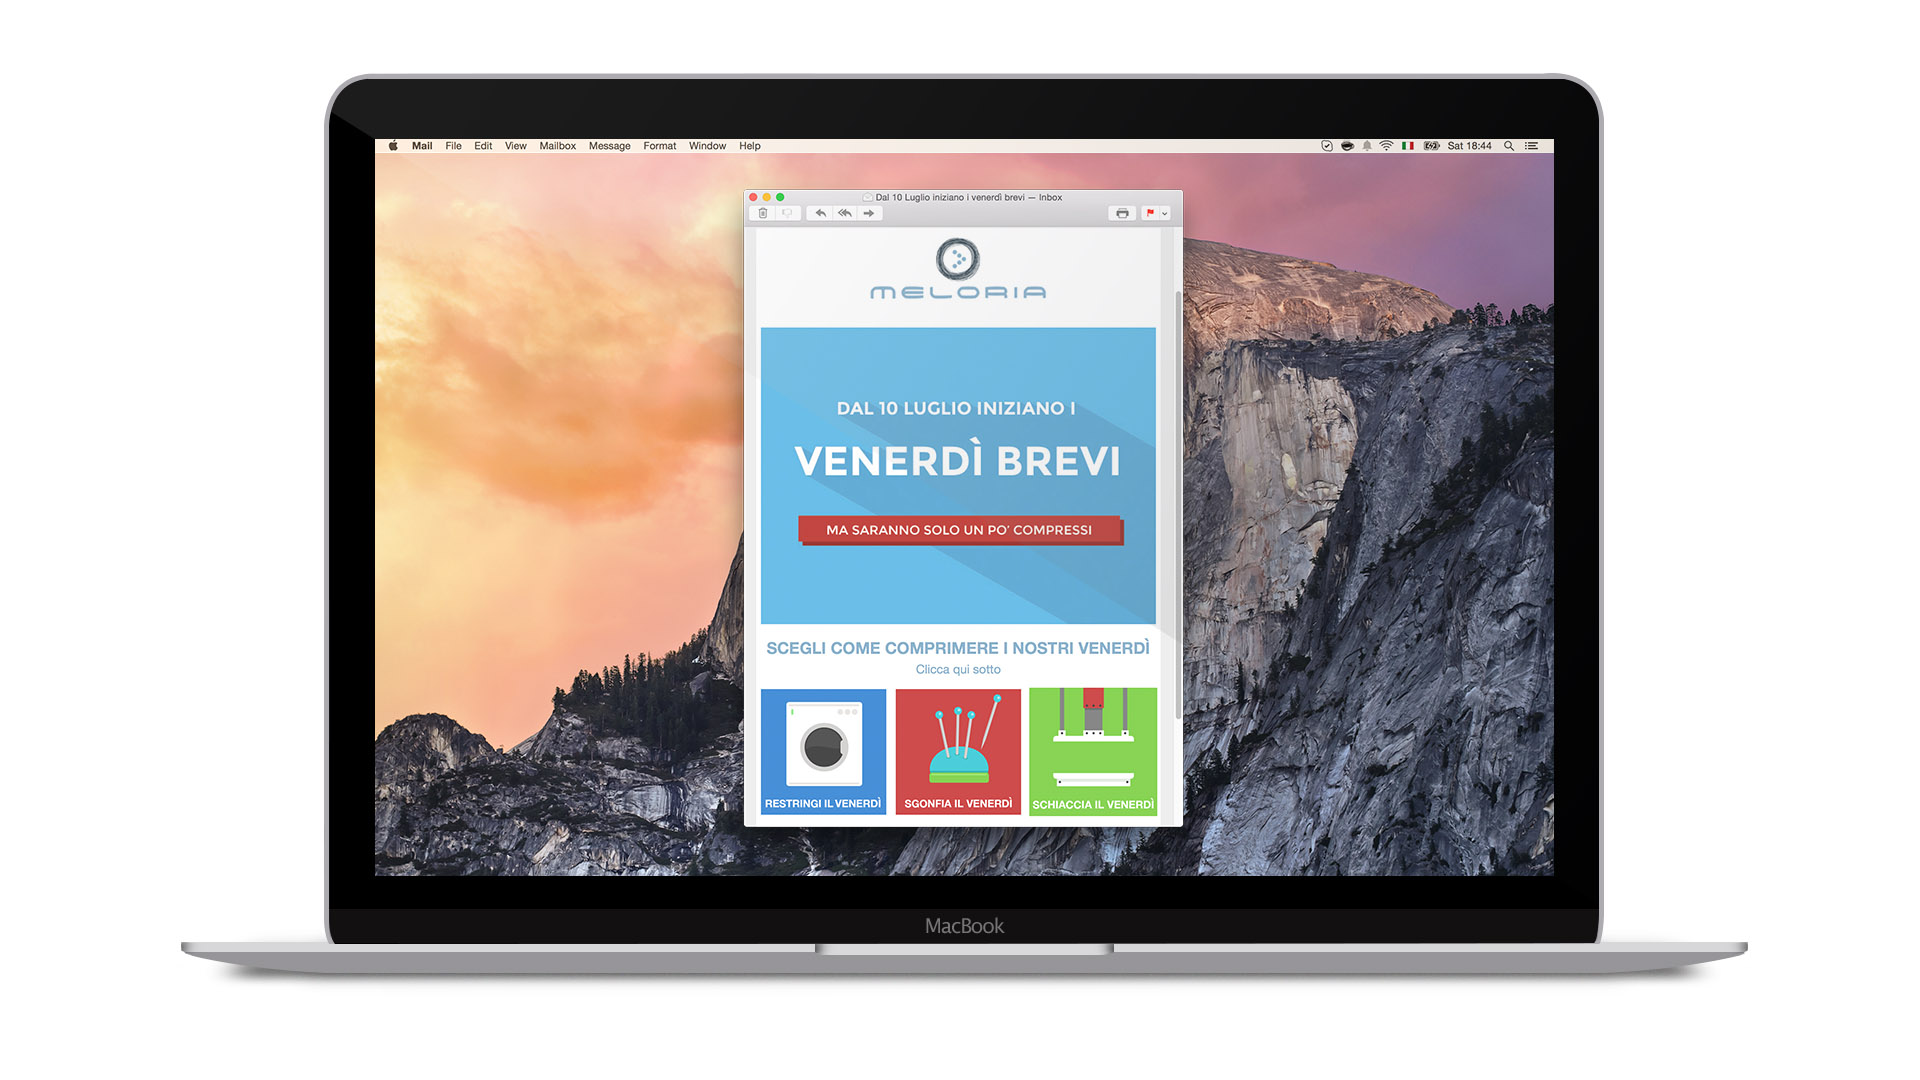 2015_MacBook-danishprakash